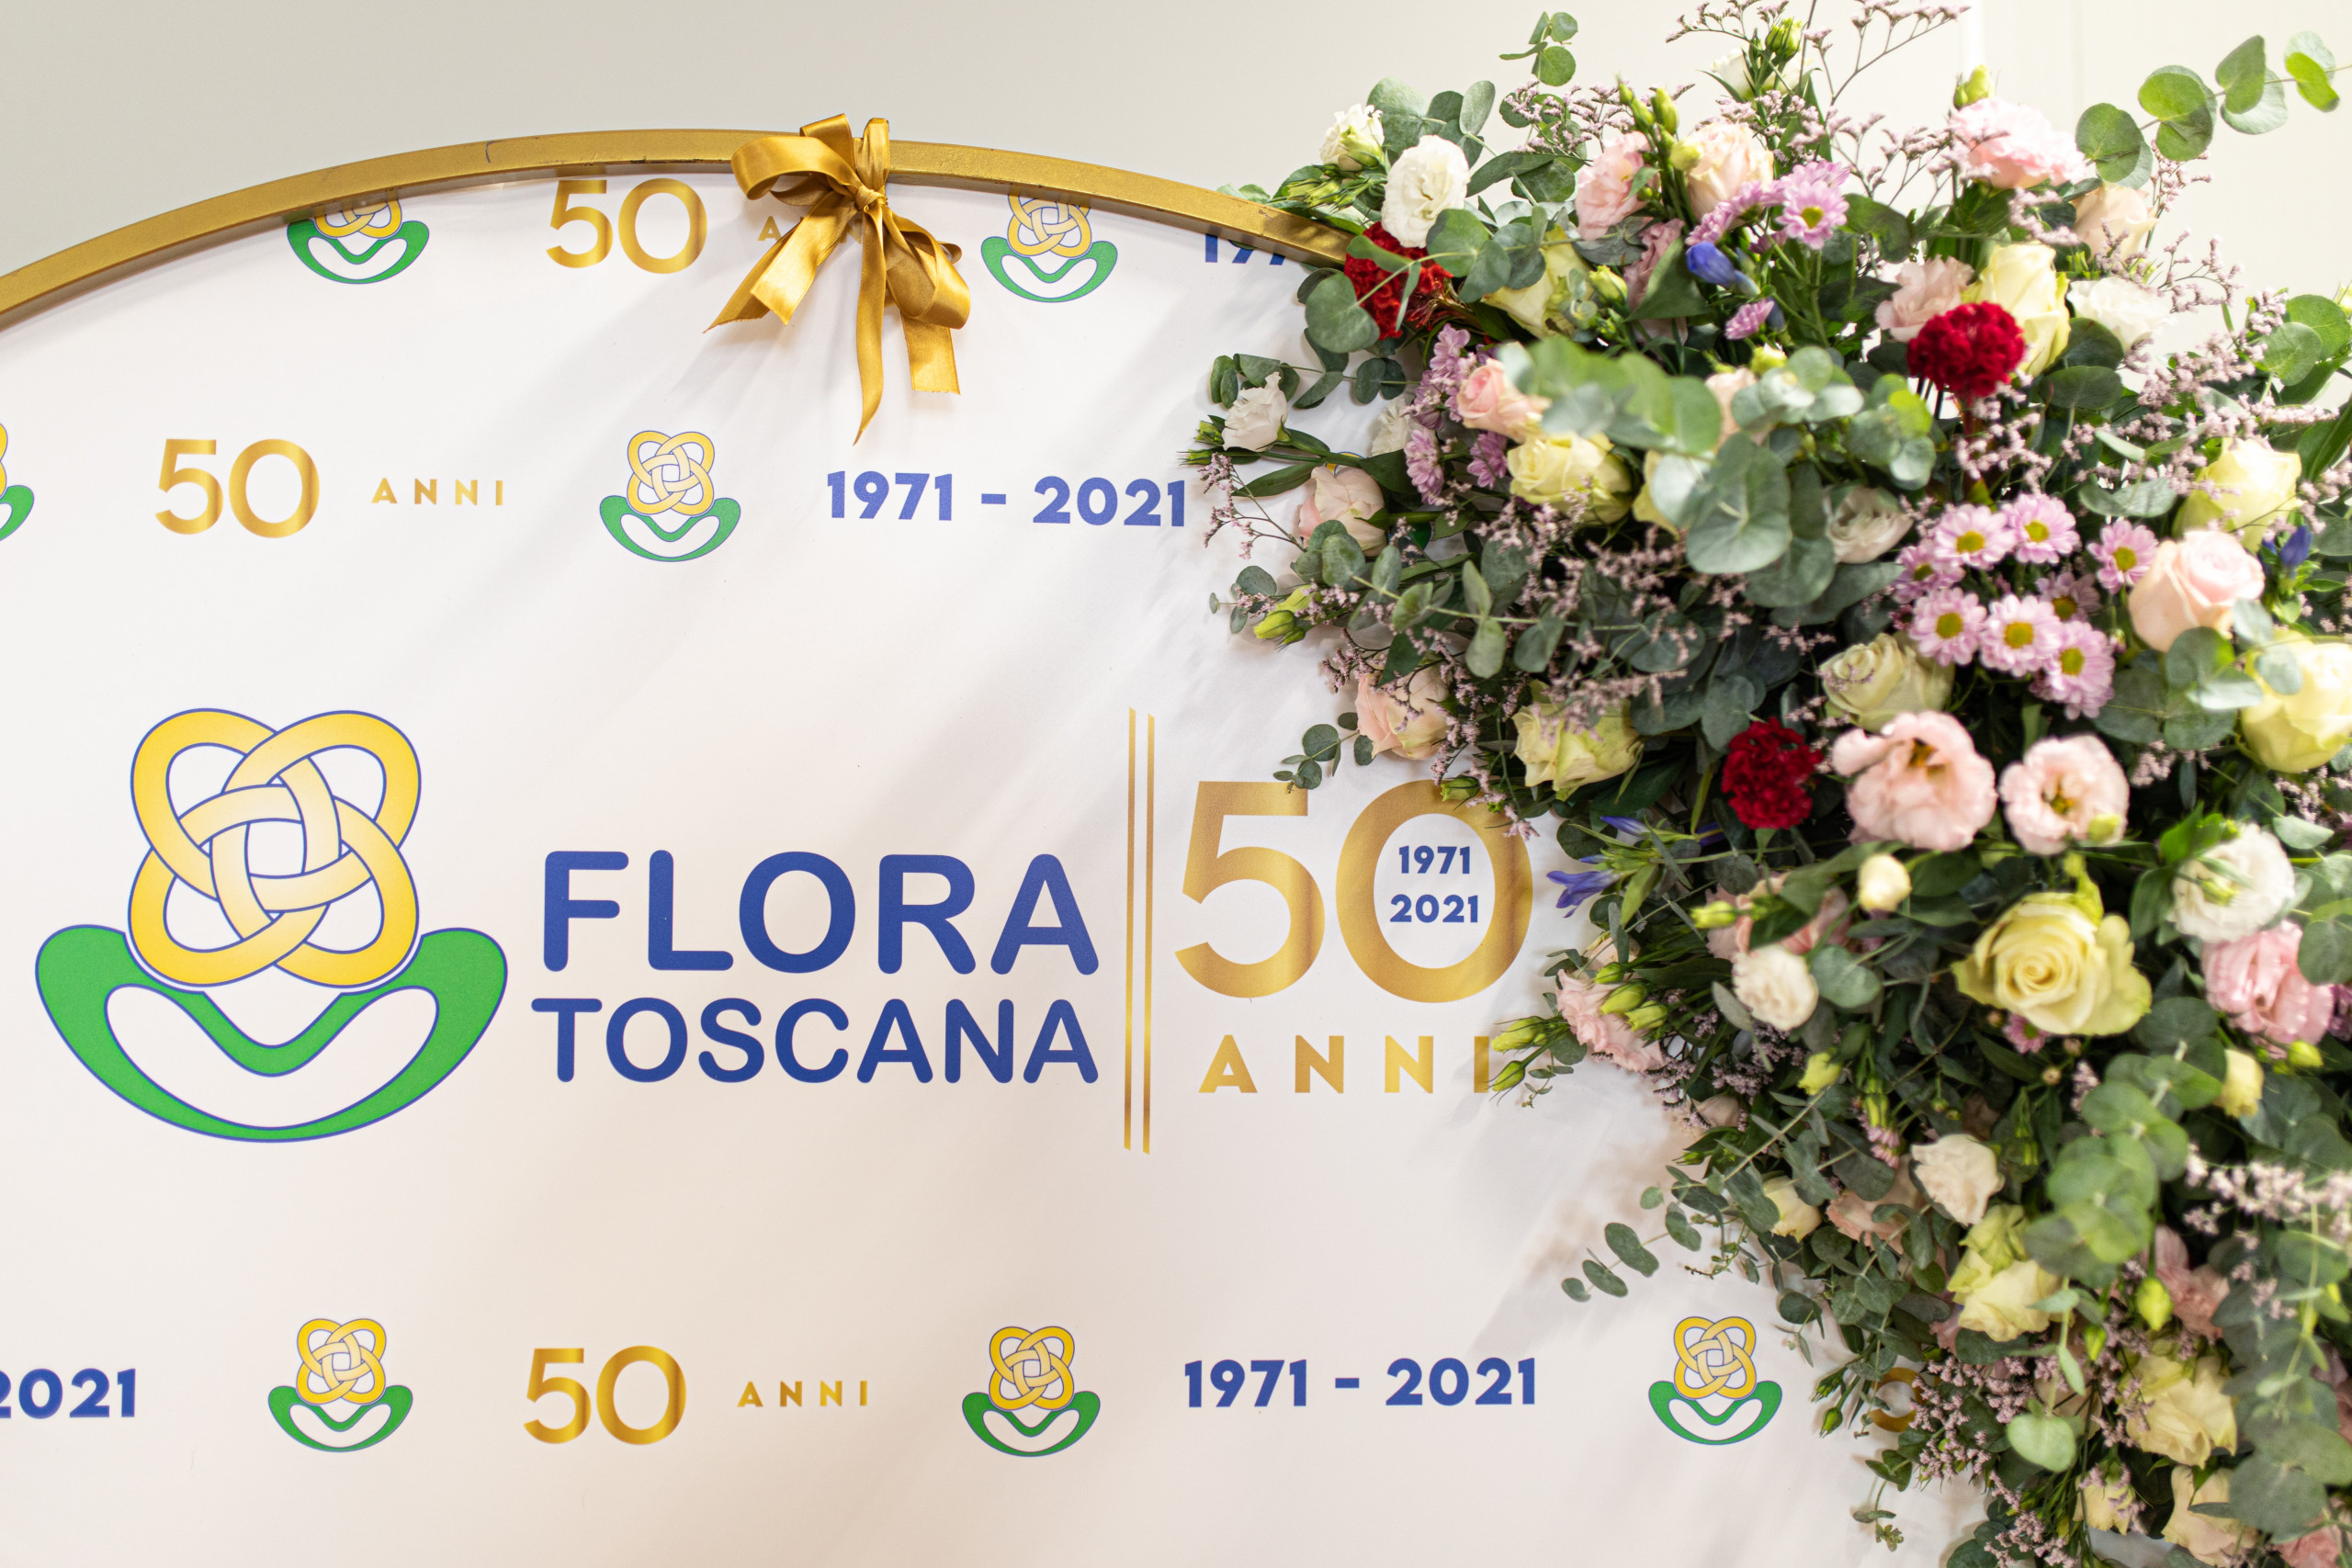 Festa 50 anni Flora Toscana